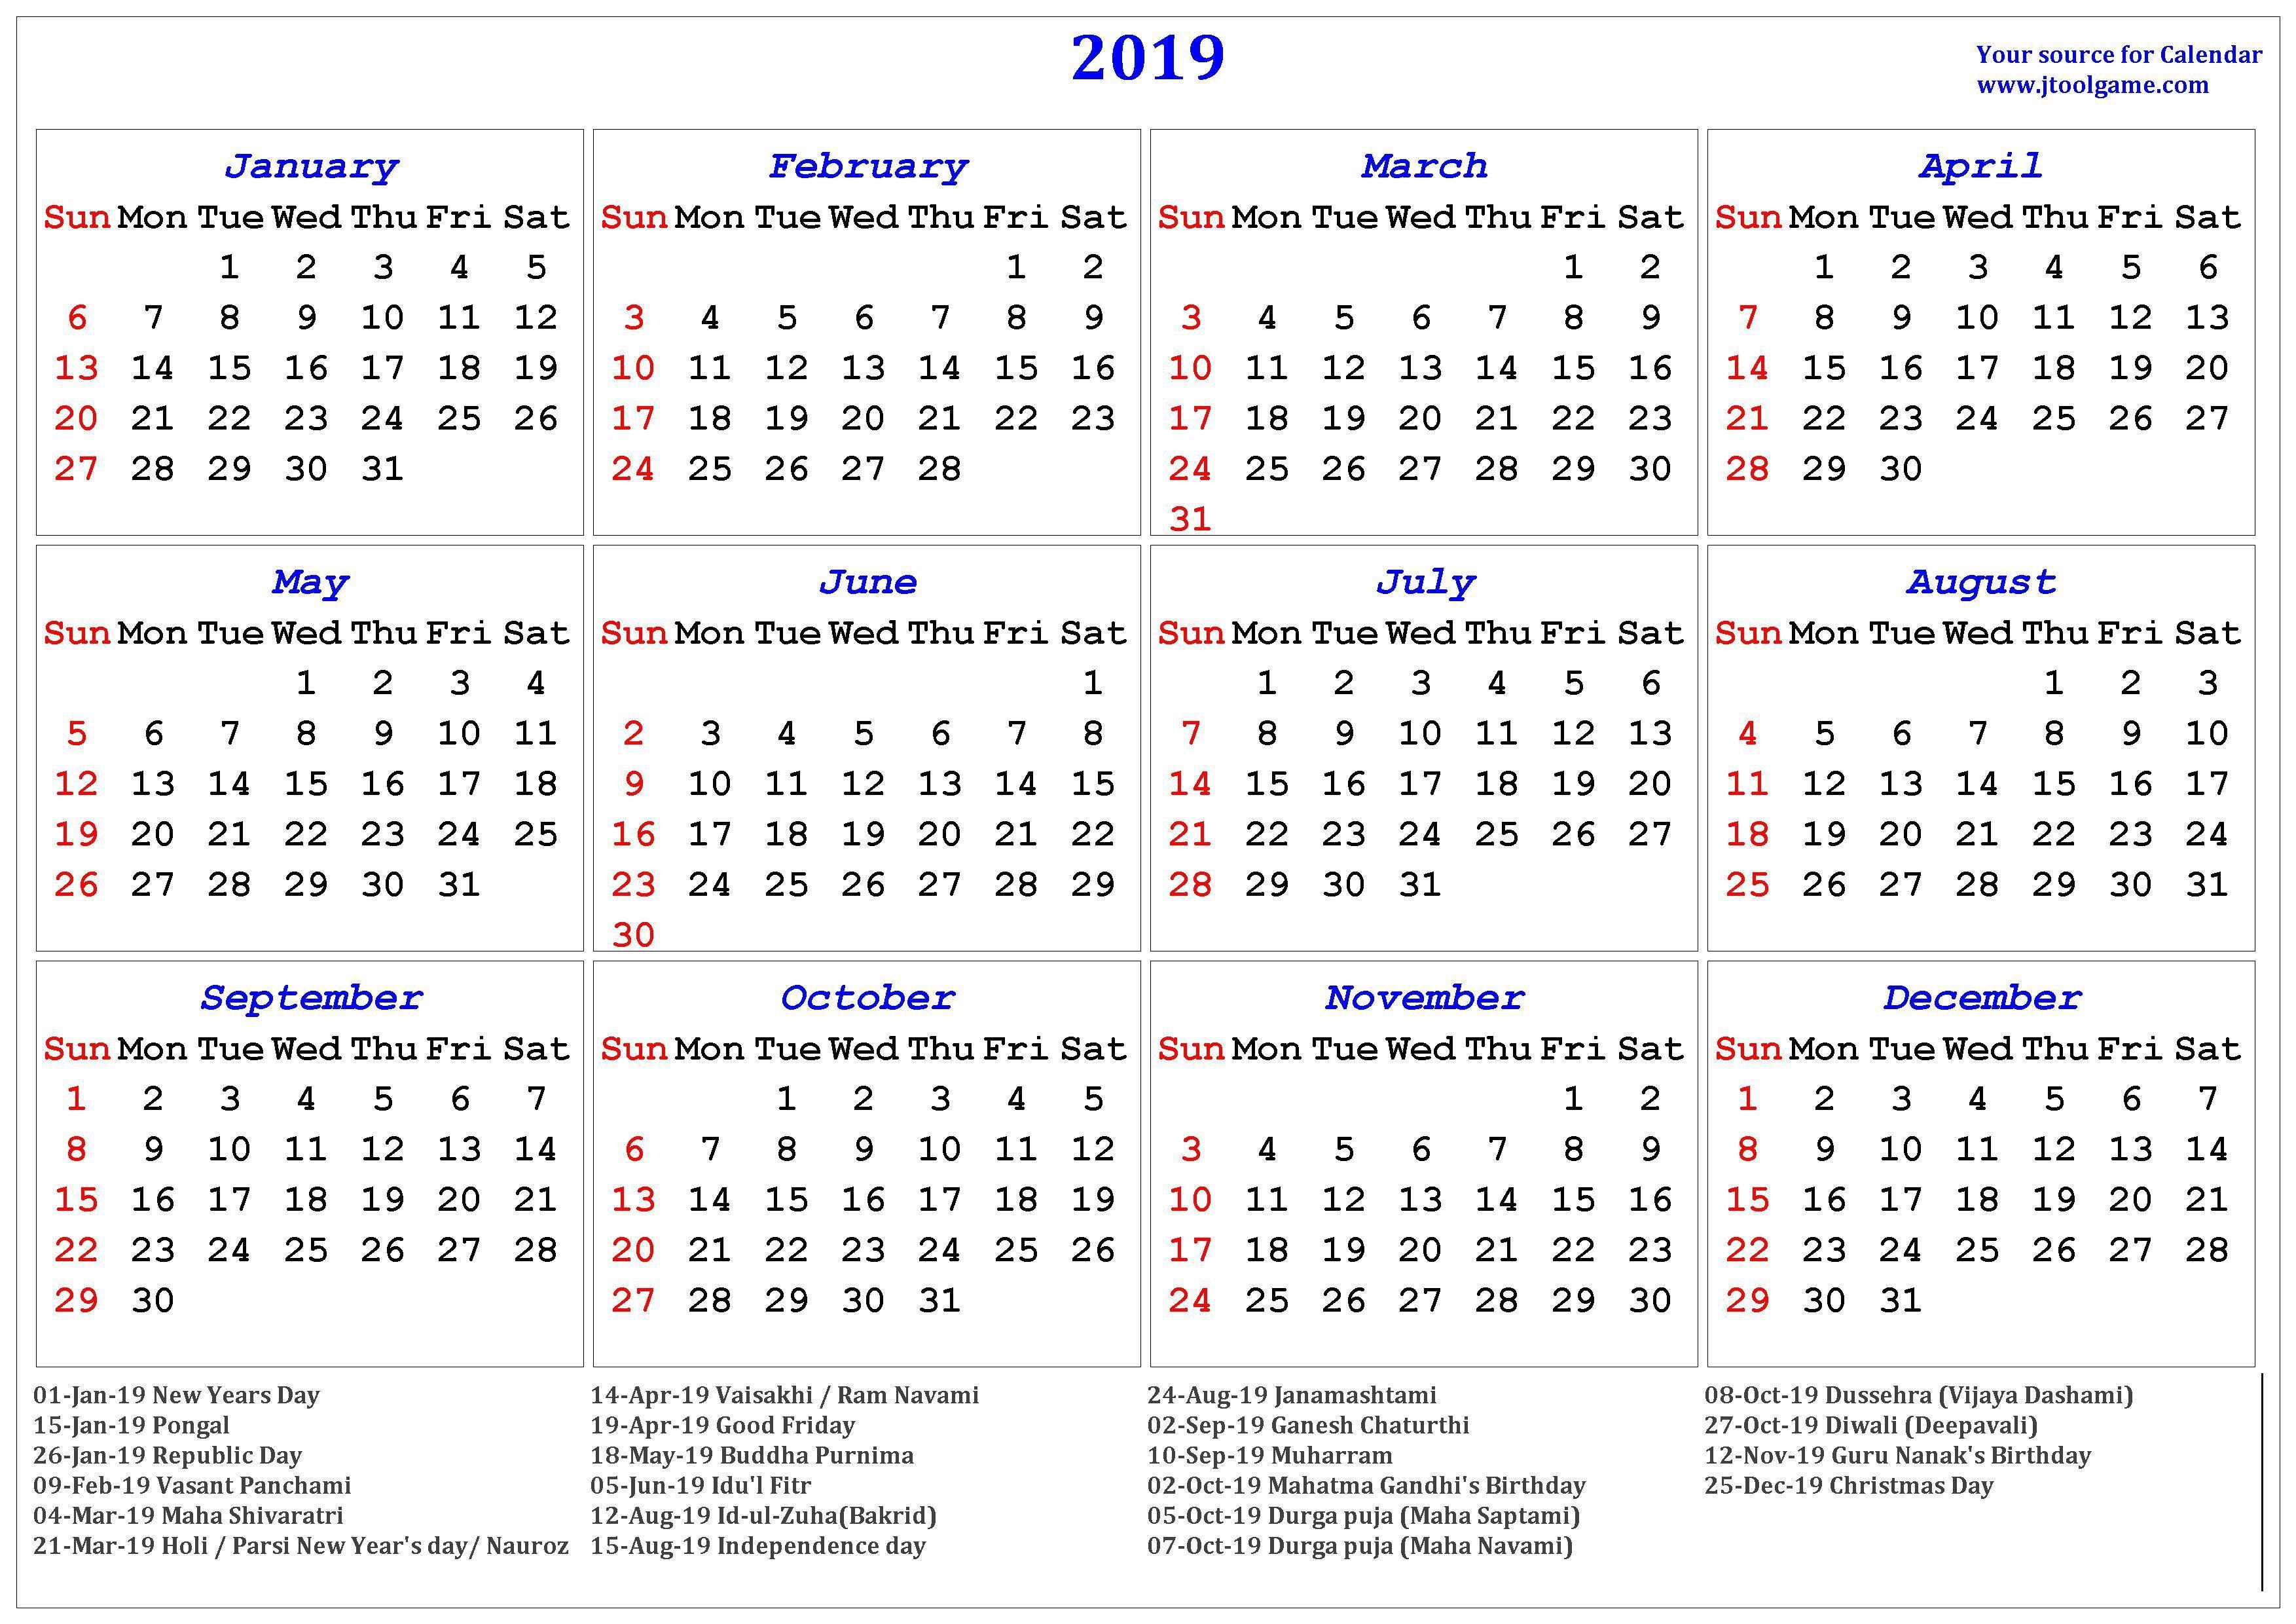 2019 Hindu Calendar 2019 Hindu Calendar Holidays Hindu Calendar 2019 Indian Printable Calendar